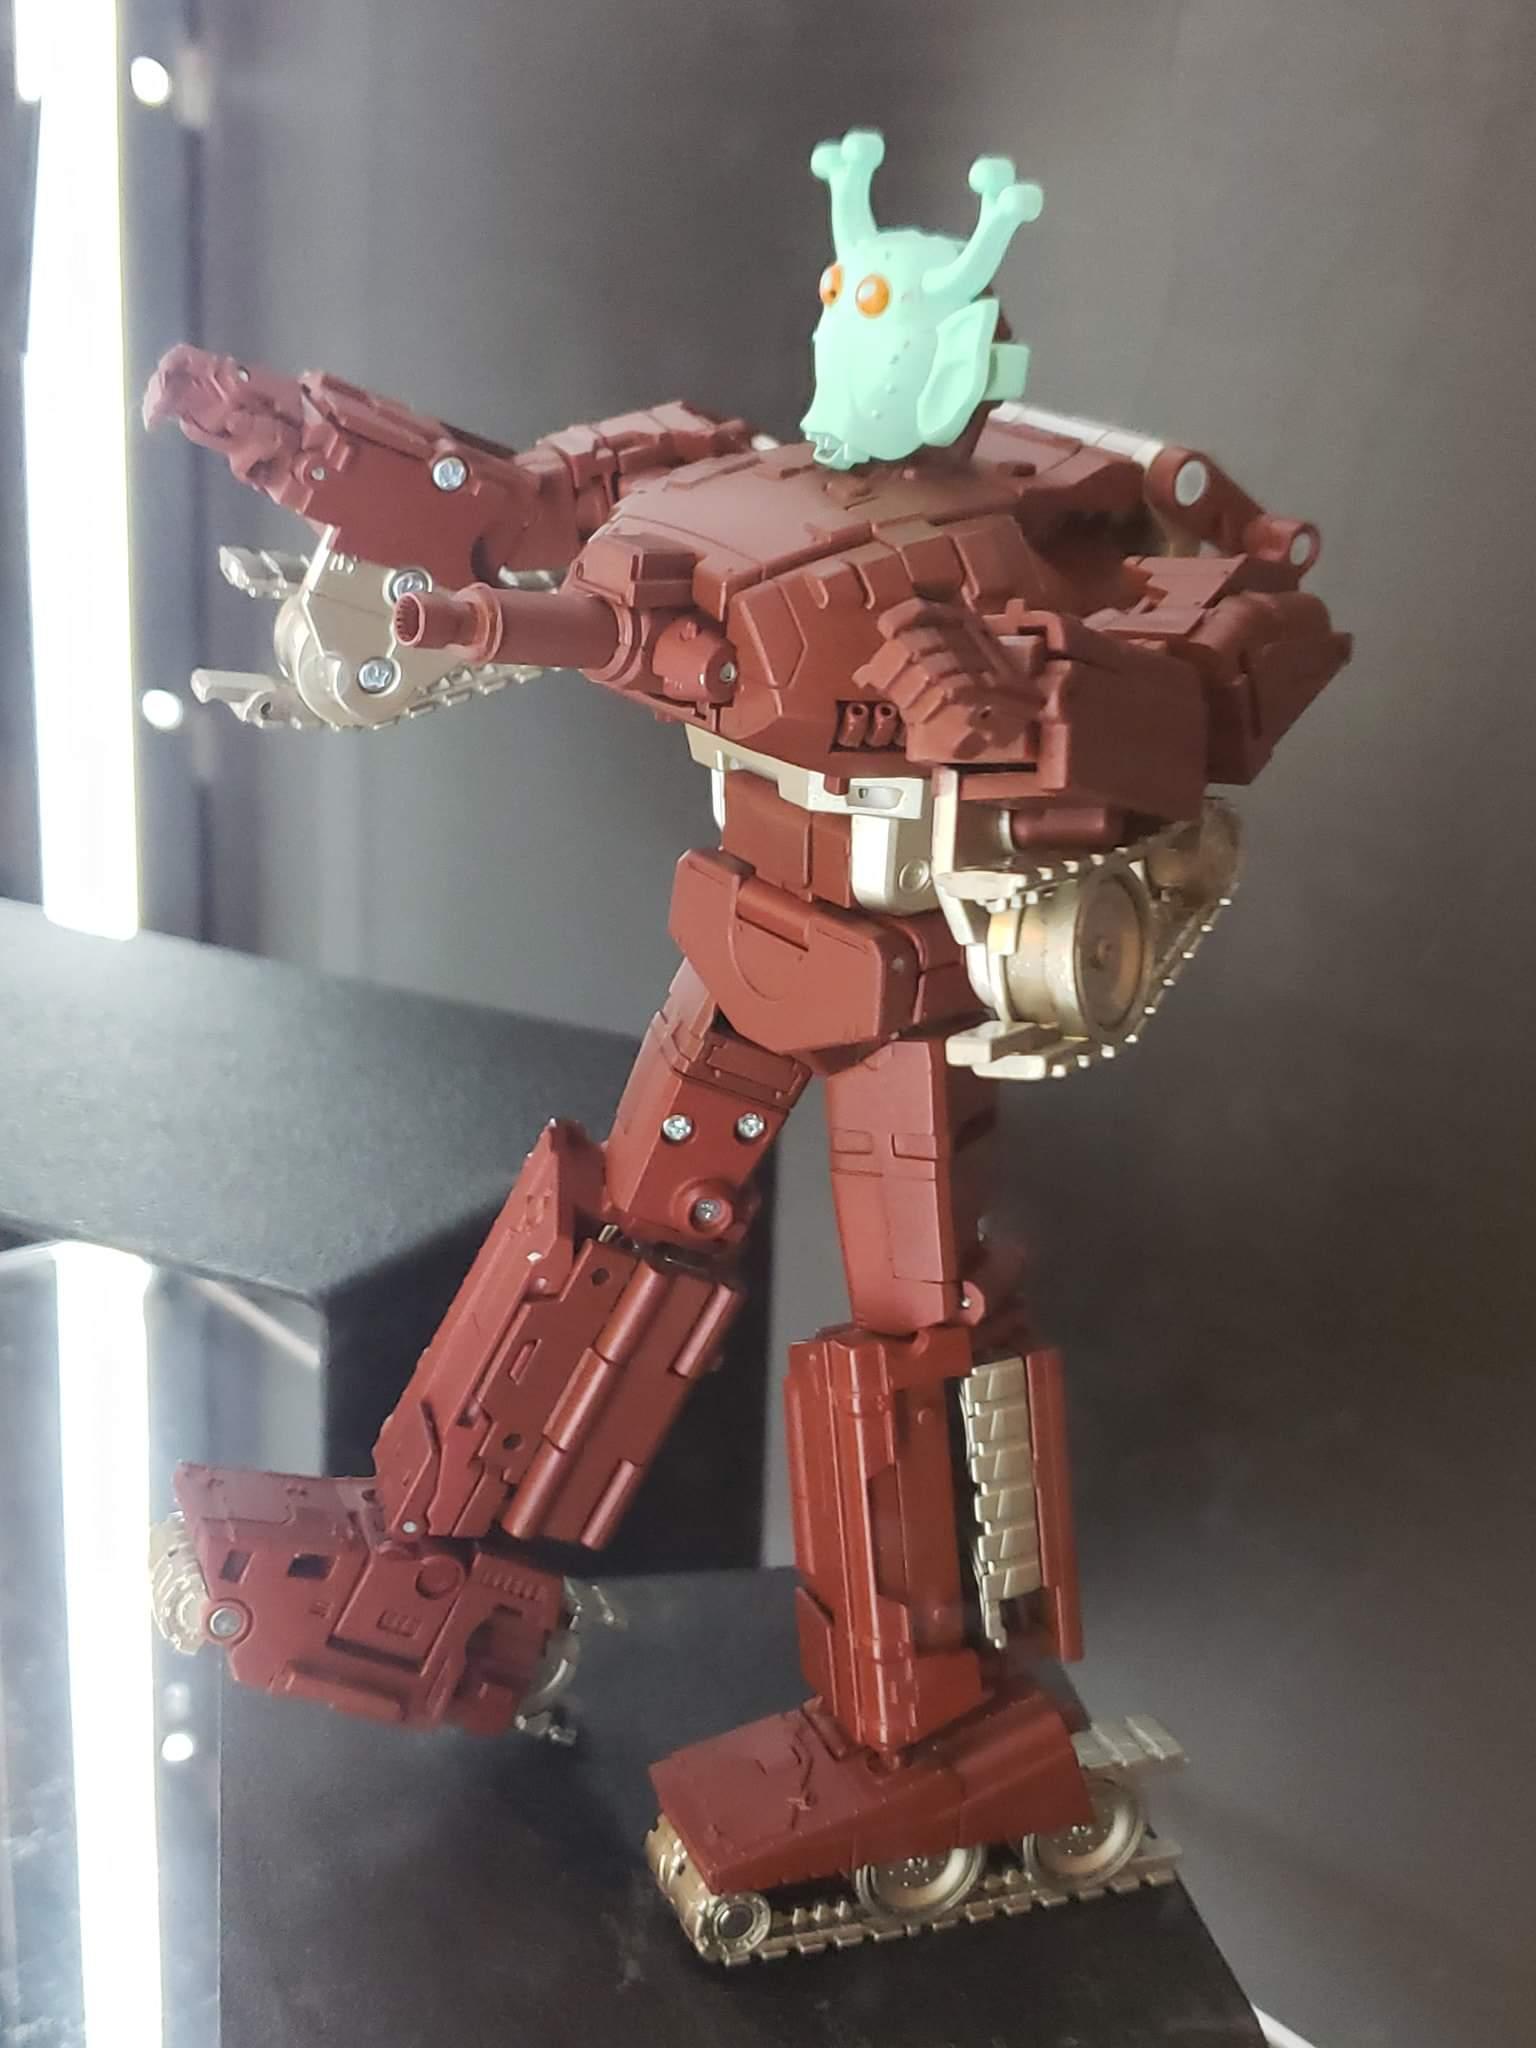 [Fanstoys] Produit Tiers - Minibots MP - Gamme FT - Page 4 KBhtO8TP_o